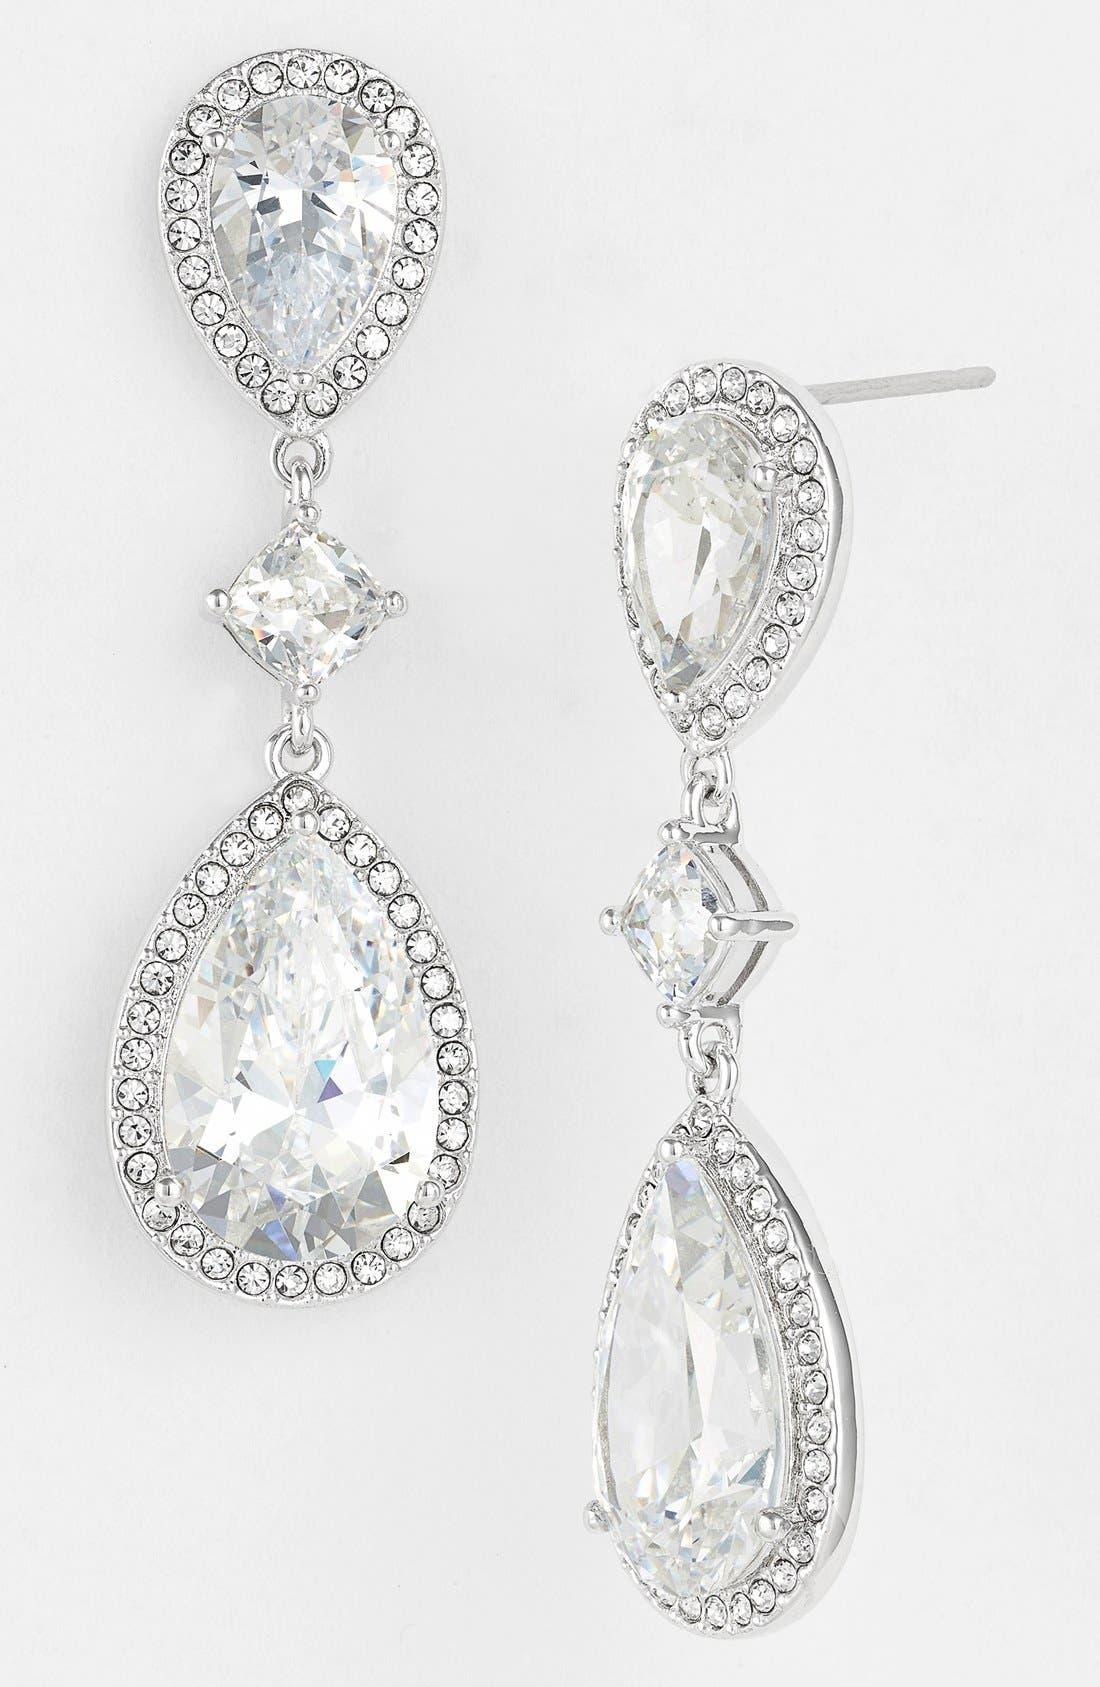 Cubic Zirconia Drop Earrings,                         Main,                         color, Silver